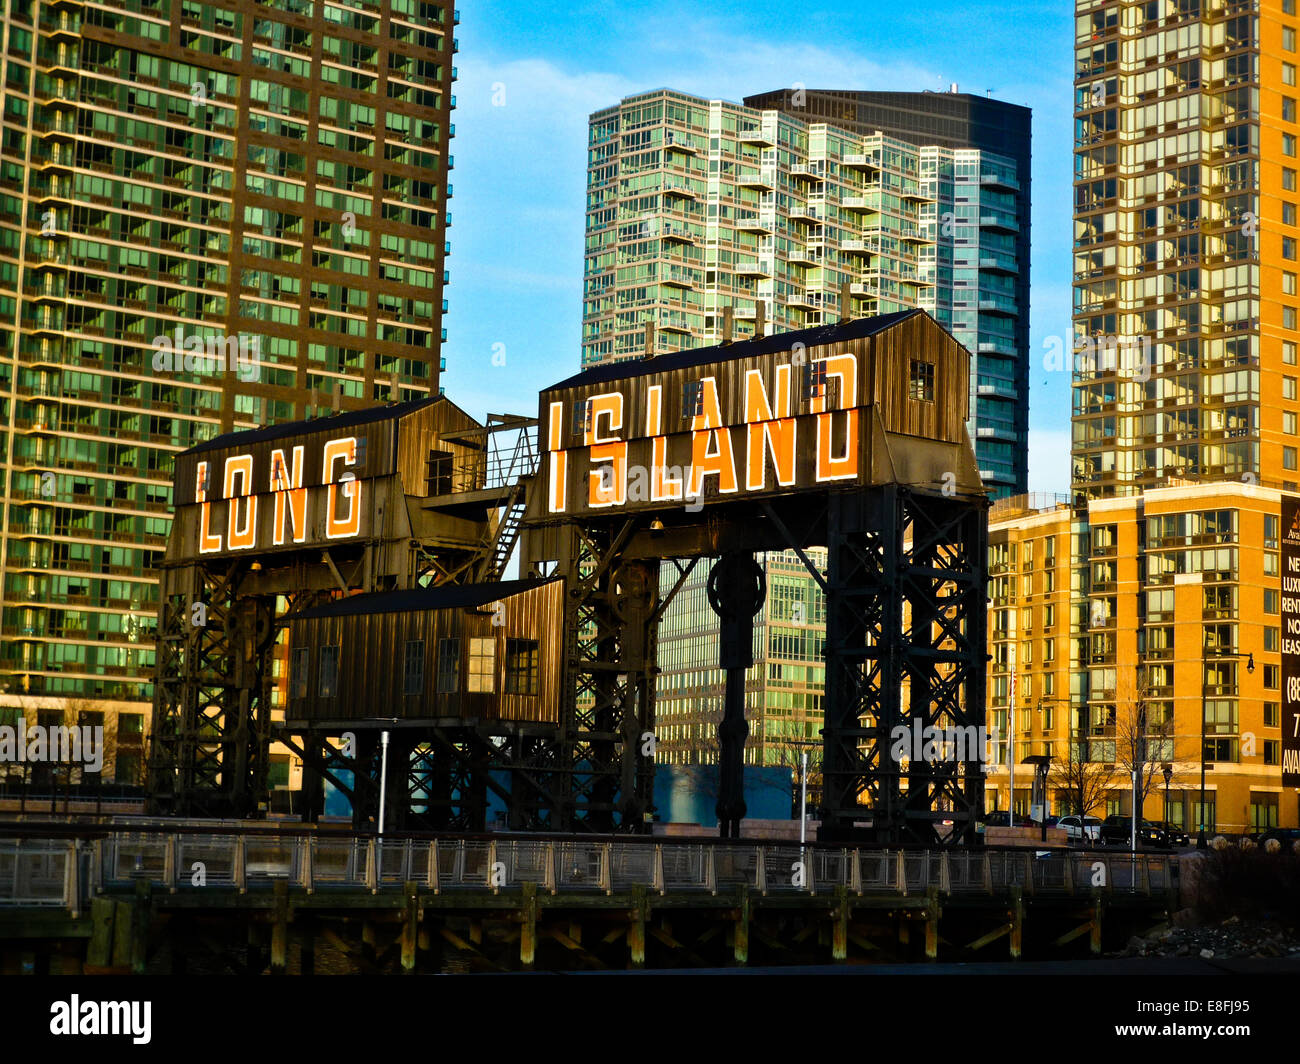 USA, New York City, Queens, Long Island City, Queens Midtown Tunnel de- Photo Stock